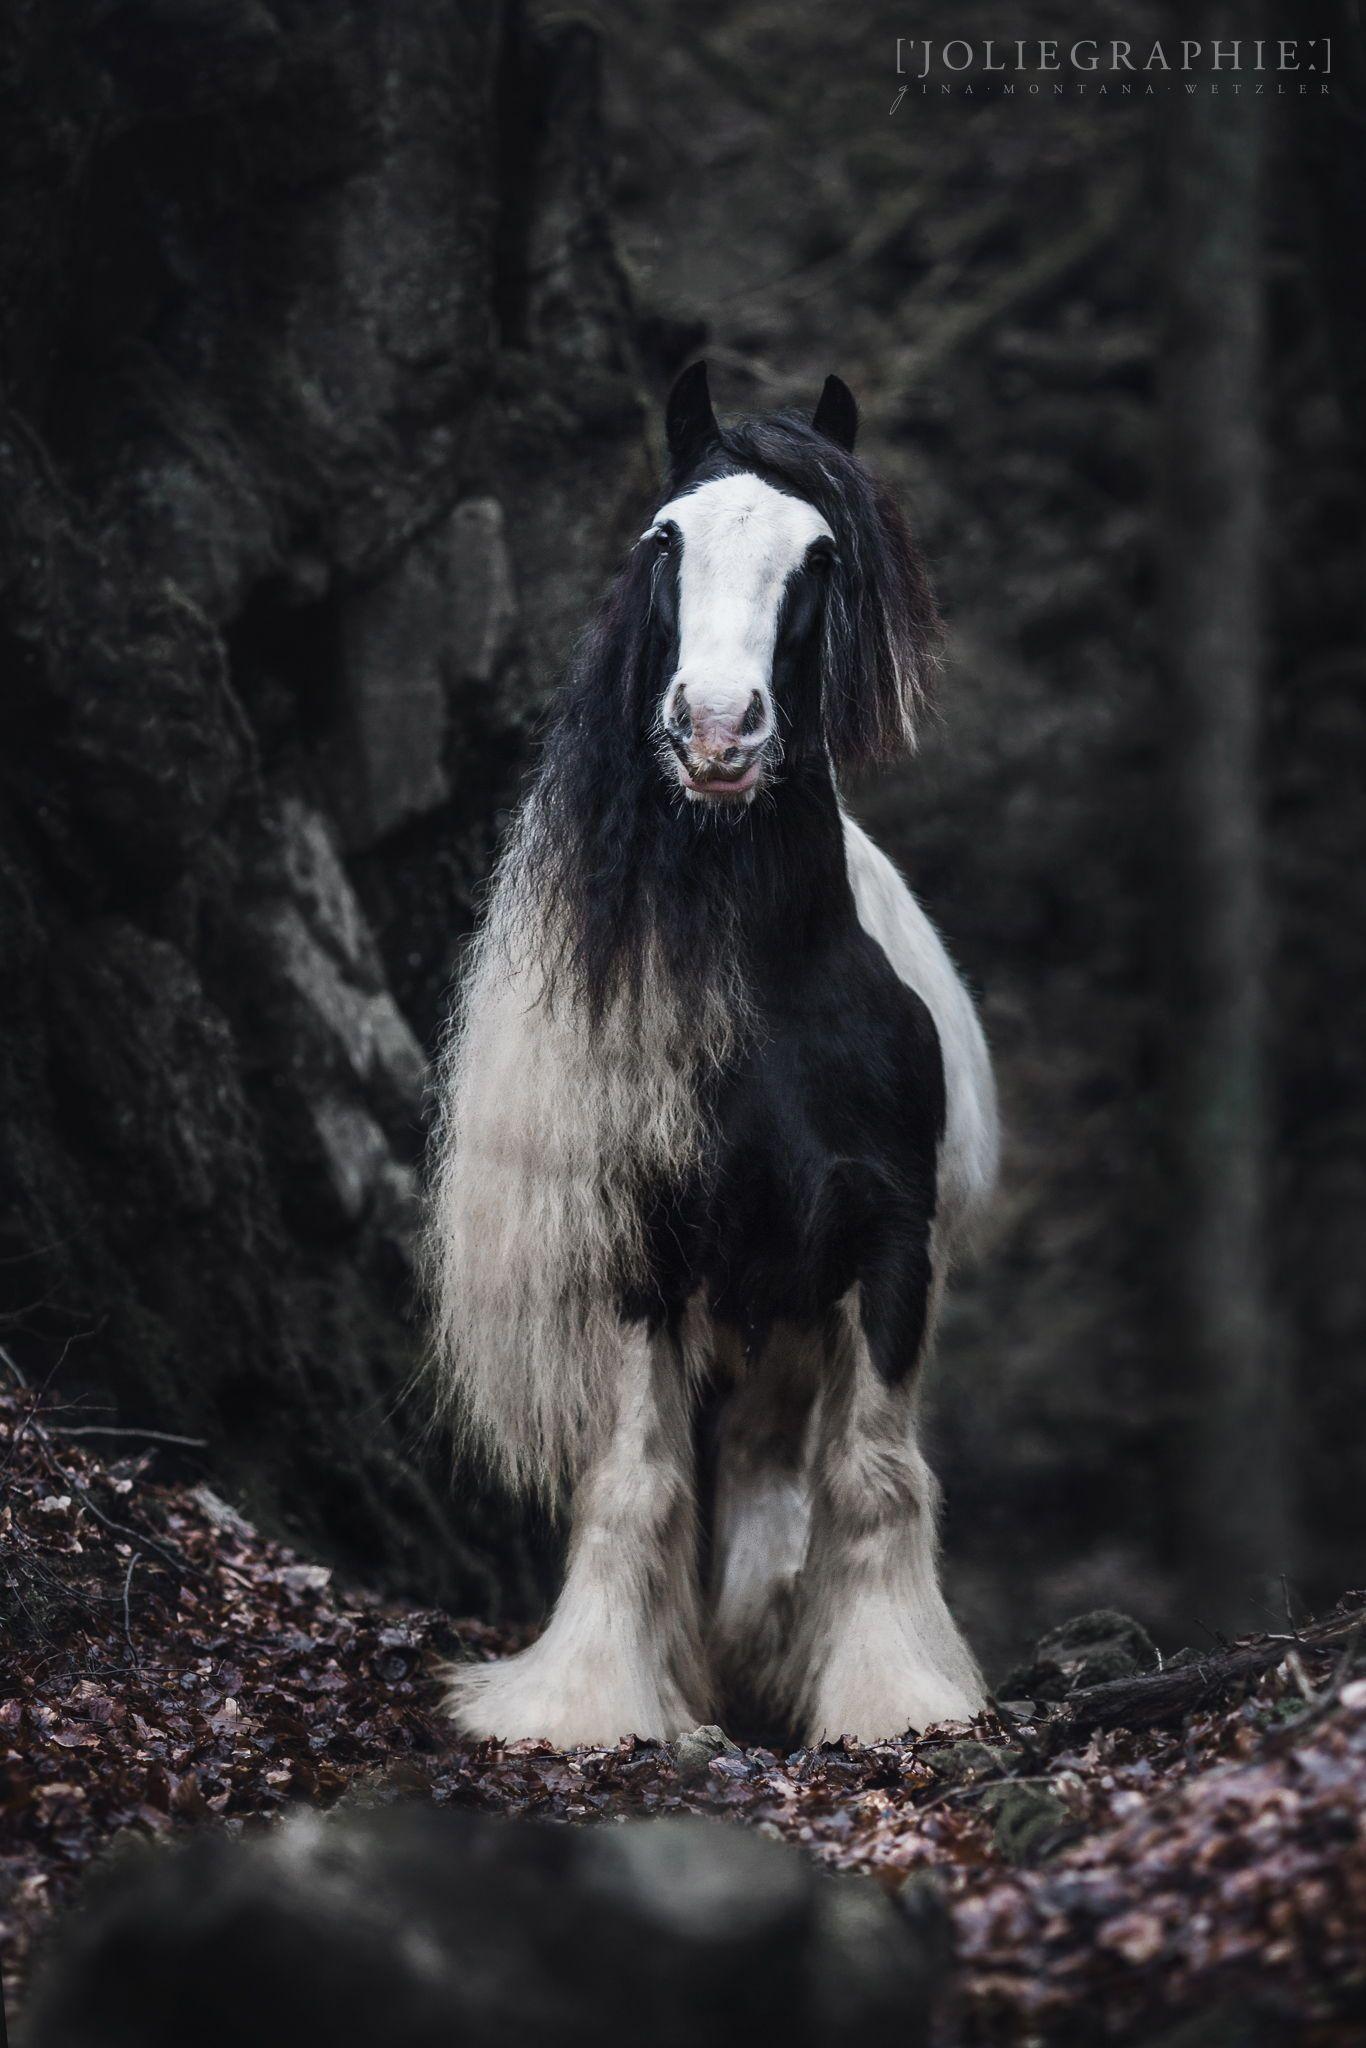 Tinker Pferd Im Portrait Tinker Horse In Portrait In 2020 Pferde Fotografie Pferdefotografie Susseste Haustiere